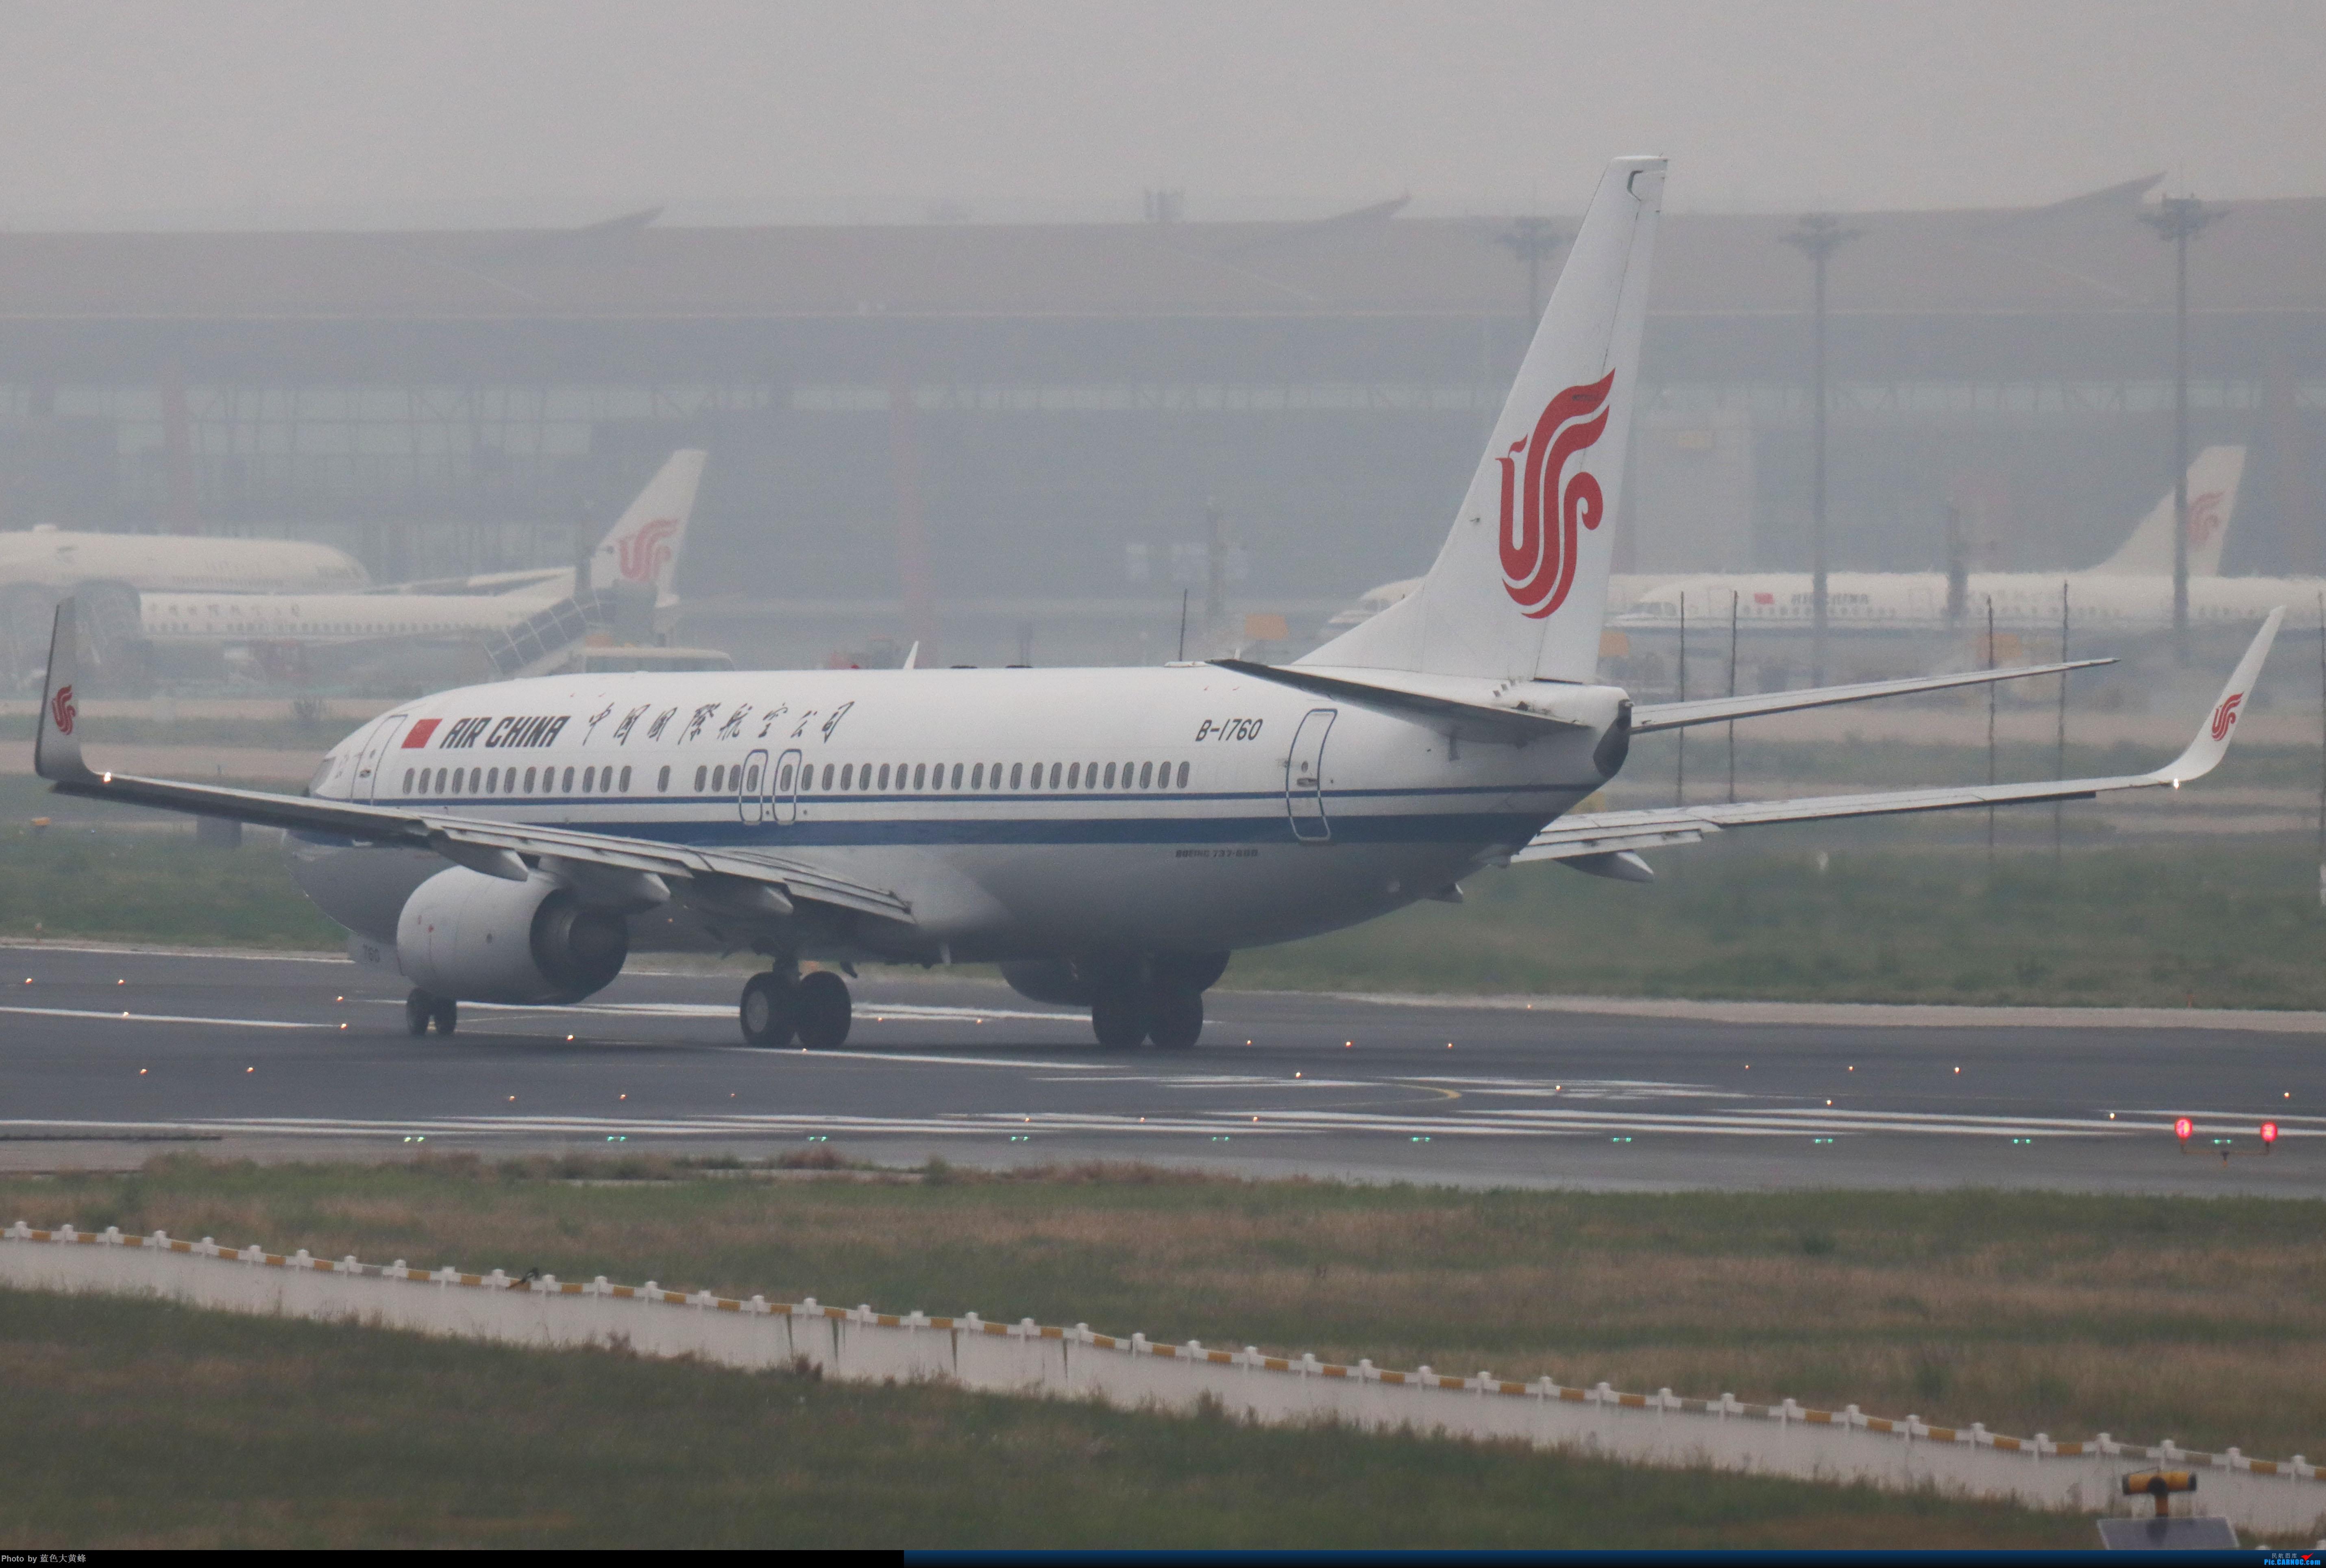 Re:[原创]烂天废片(持续更新) BOEING 737-800 B-1760 中国北京首都国际机场